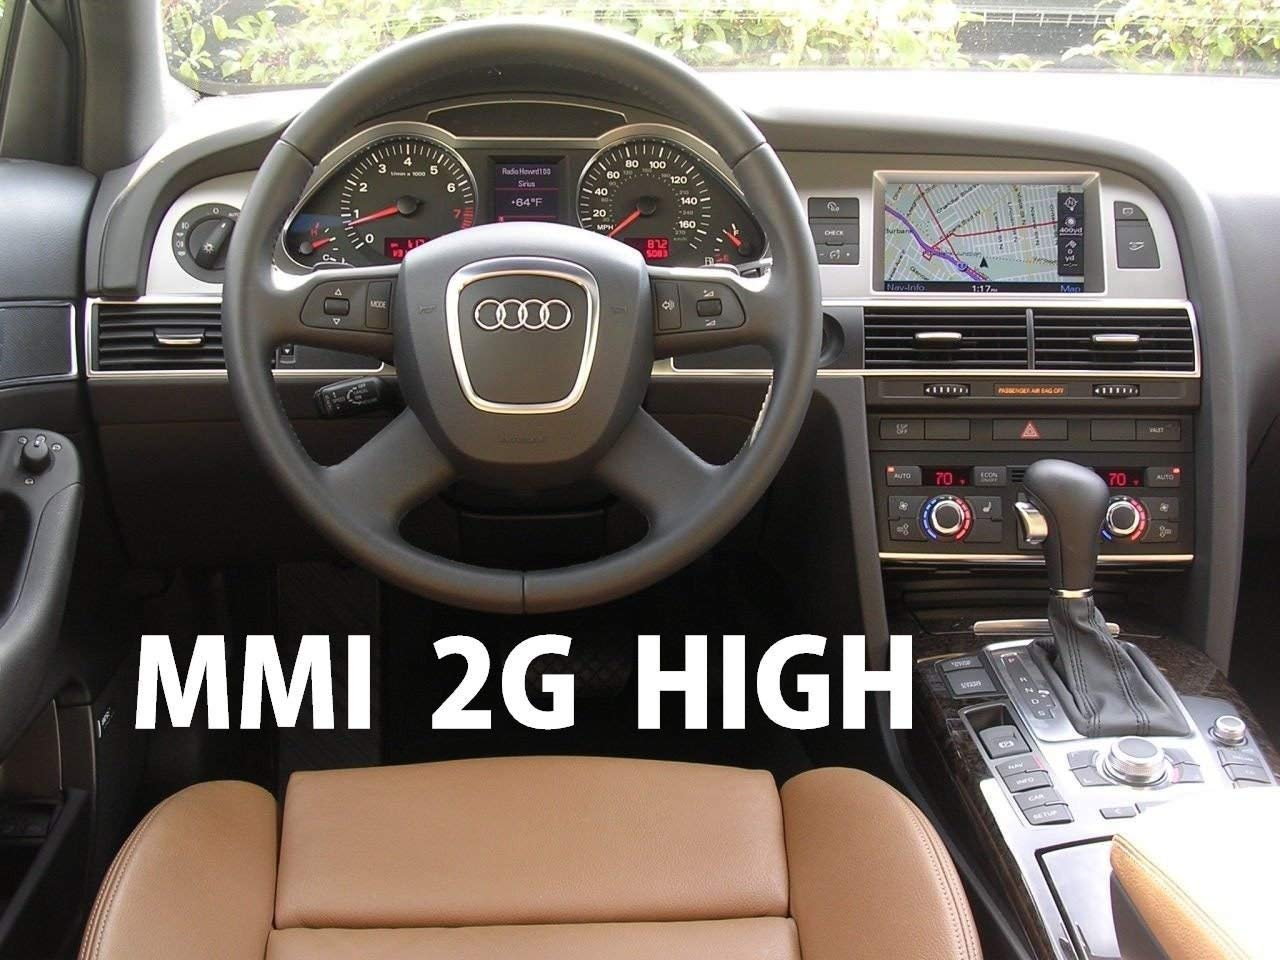 Europa 2018 DVD1+DVD2 Audi MMI 2G High Navigation